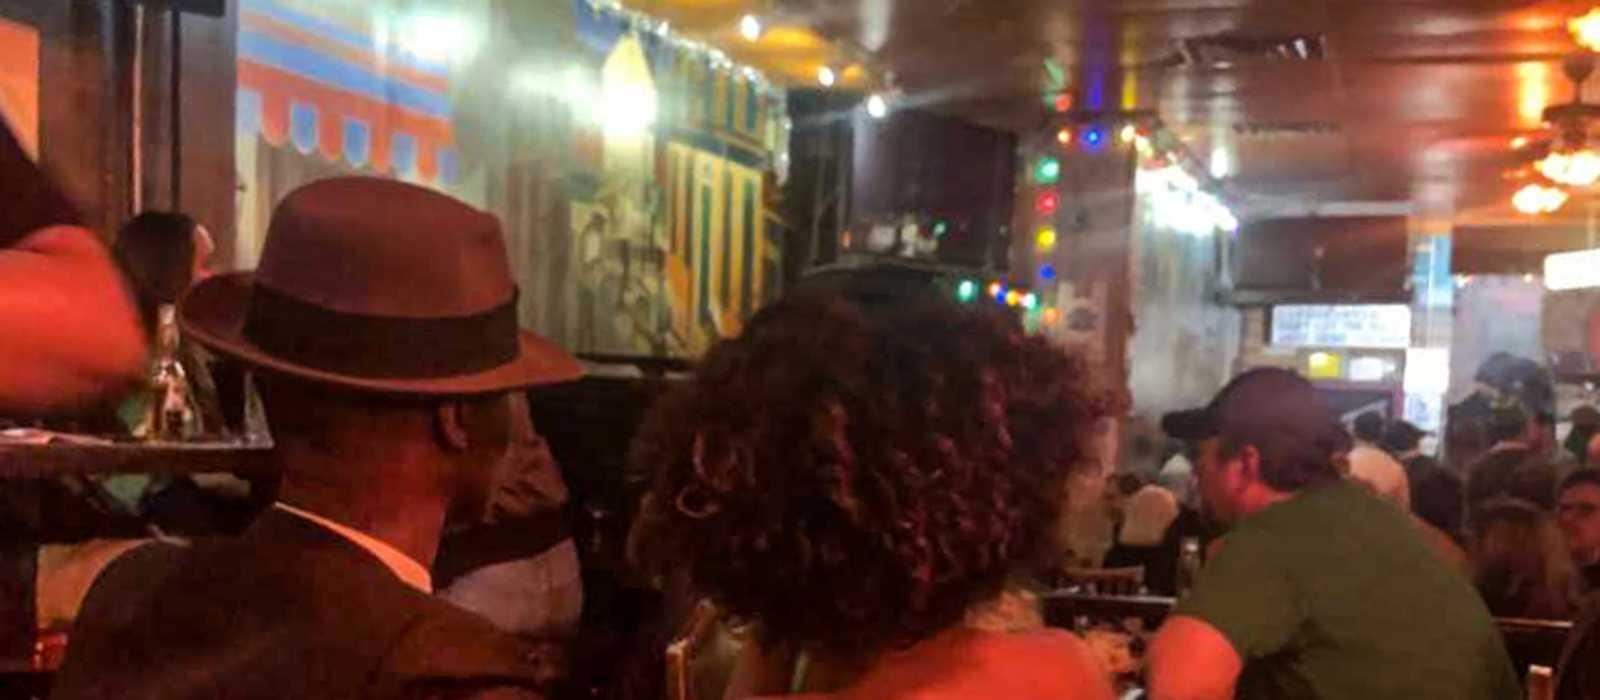 Kingston Mines Blues Bar